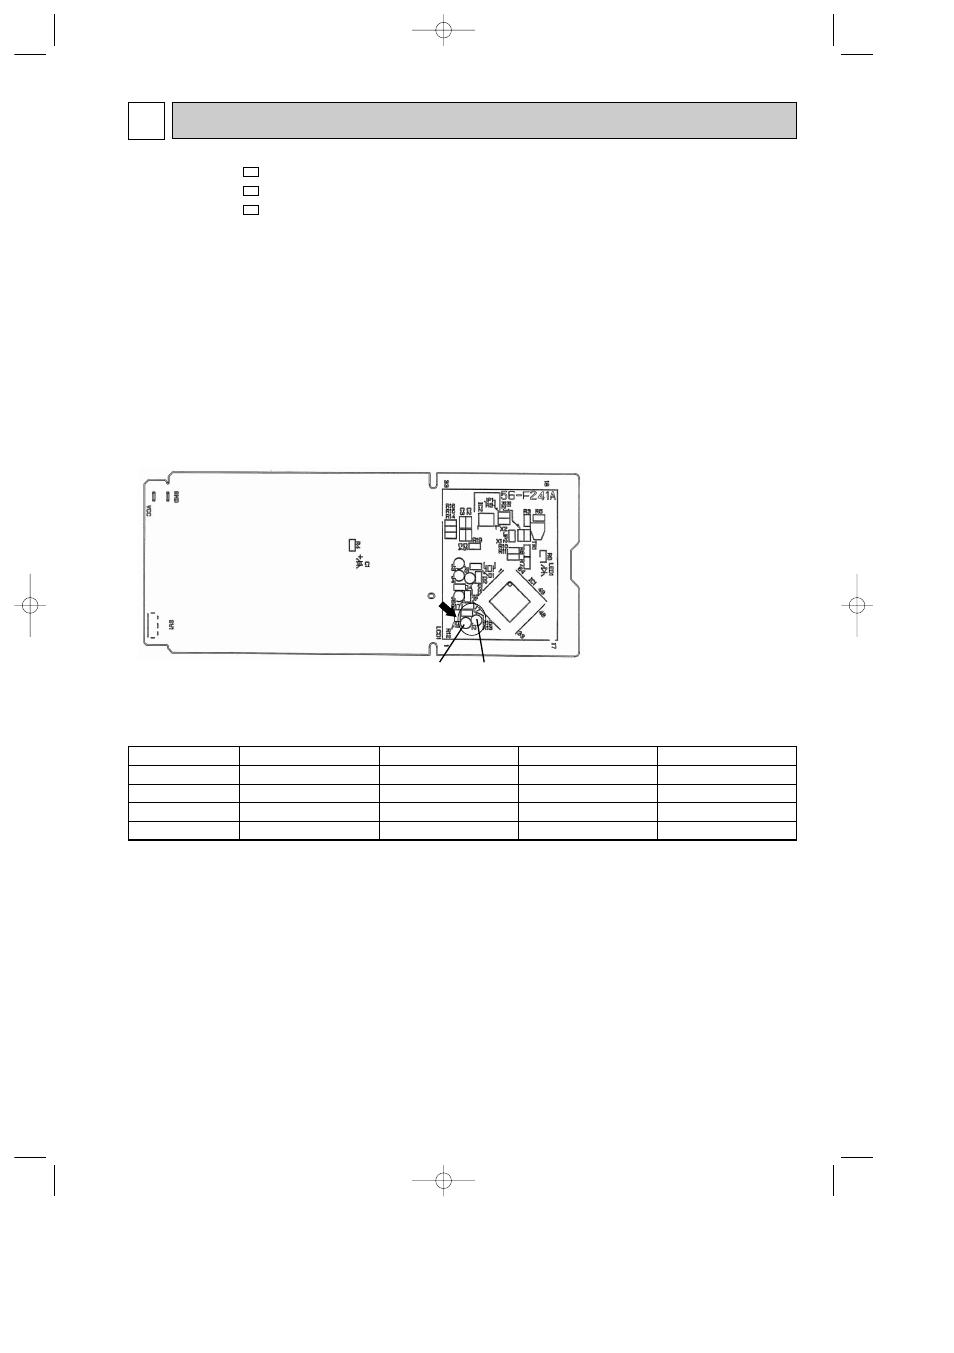 Mitsubishi electric msz-ga25va e3 service manual.